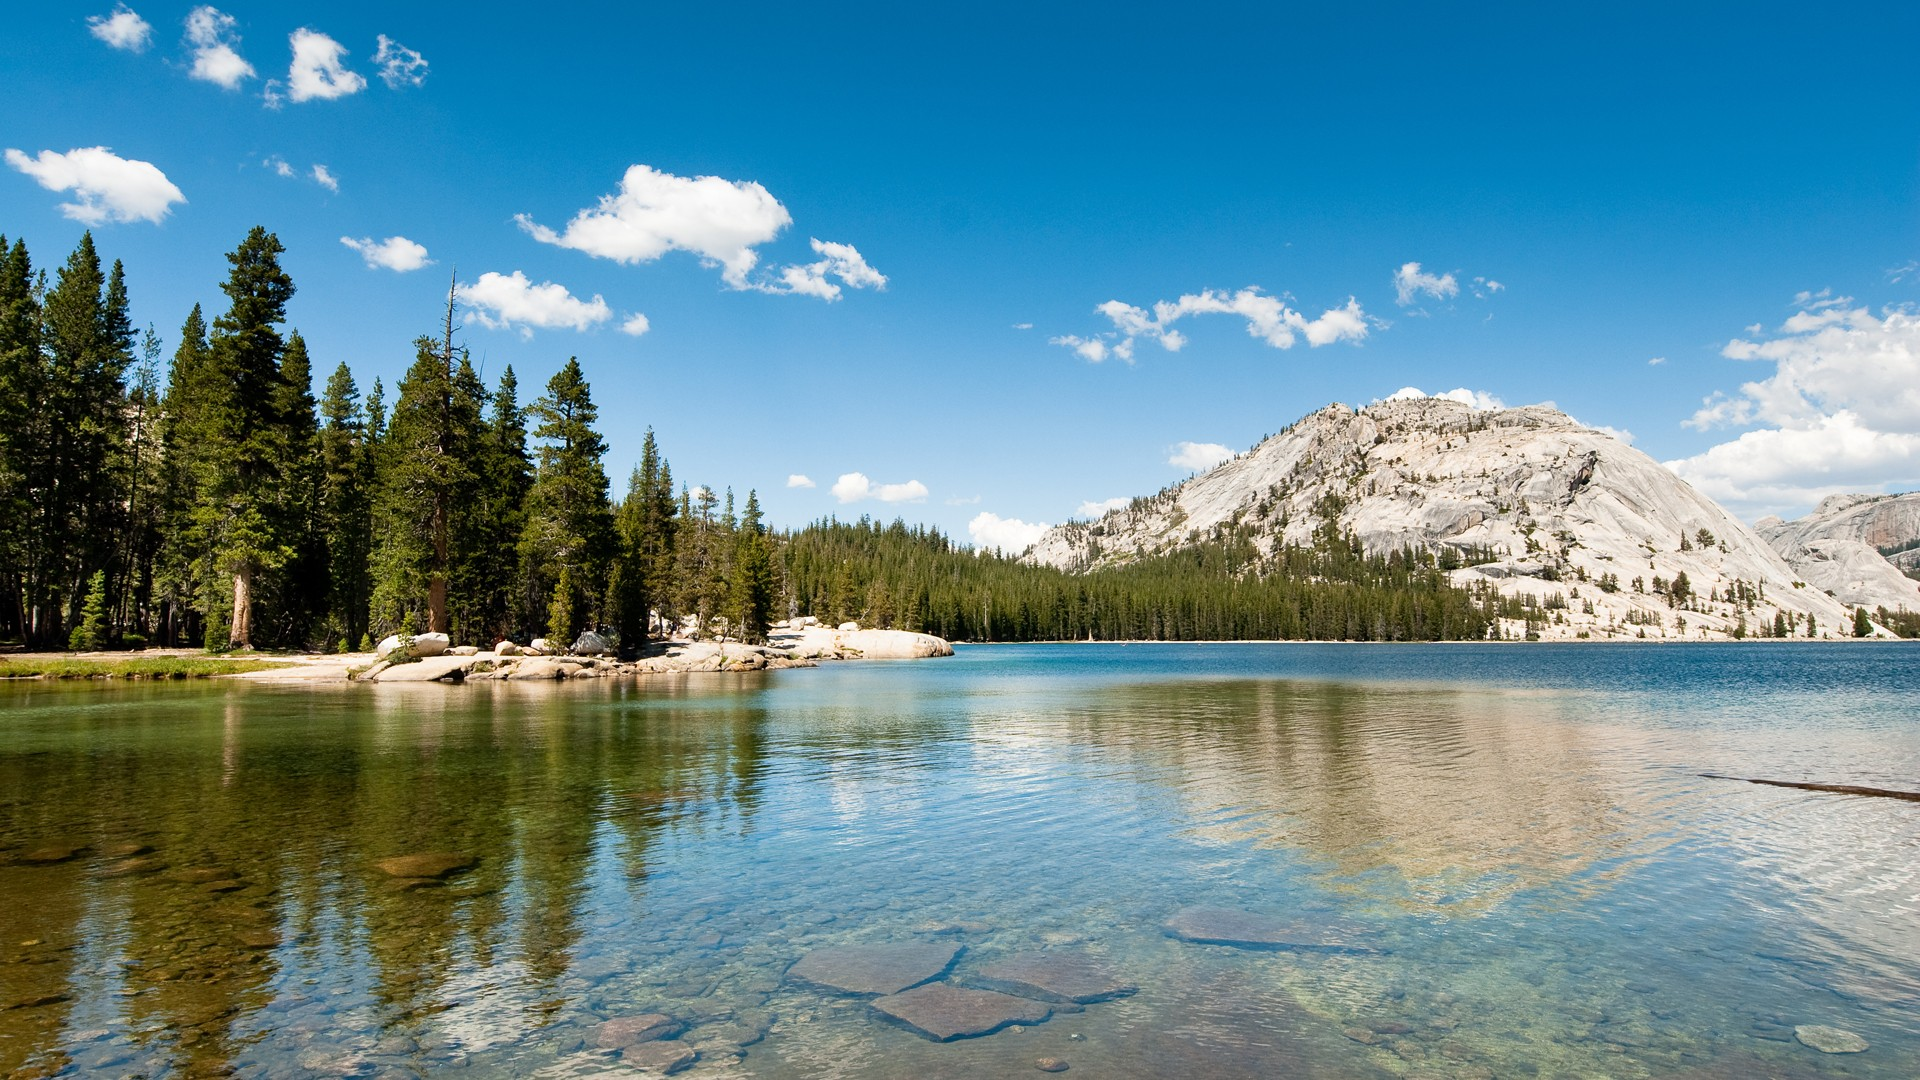 General 1920x1080 landscape nature lake hills forest pine trees Yosemite National Park California